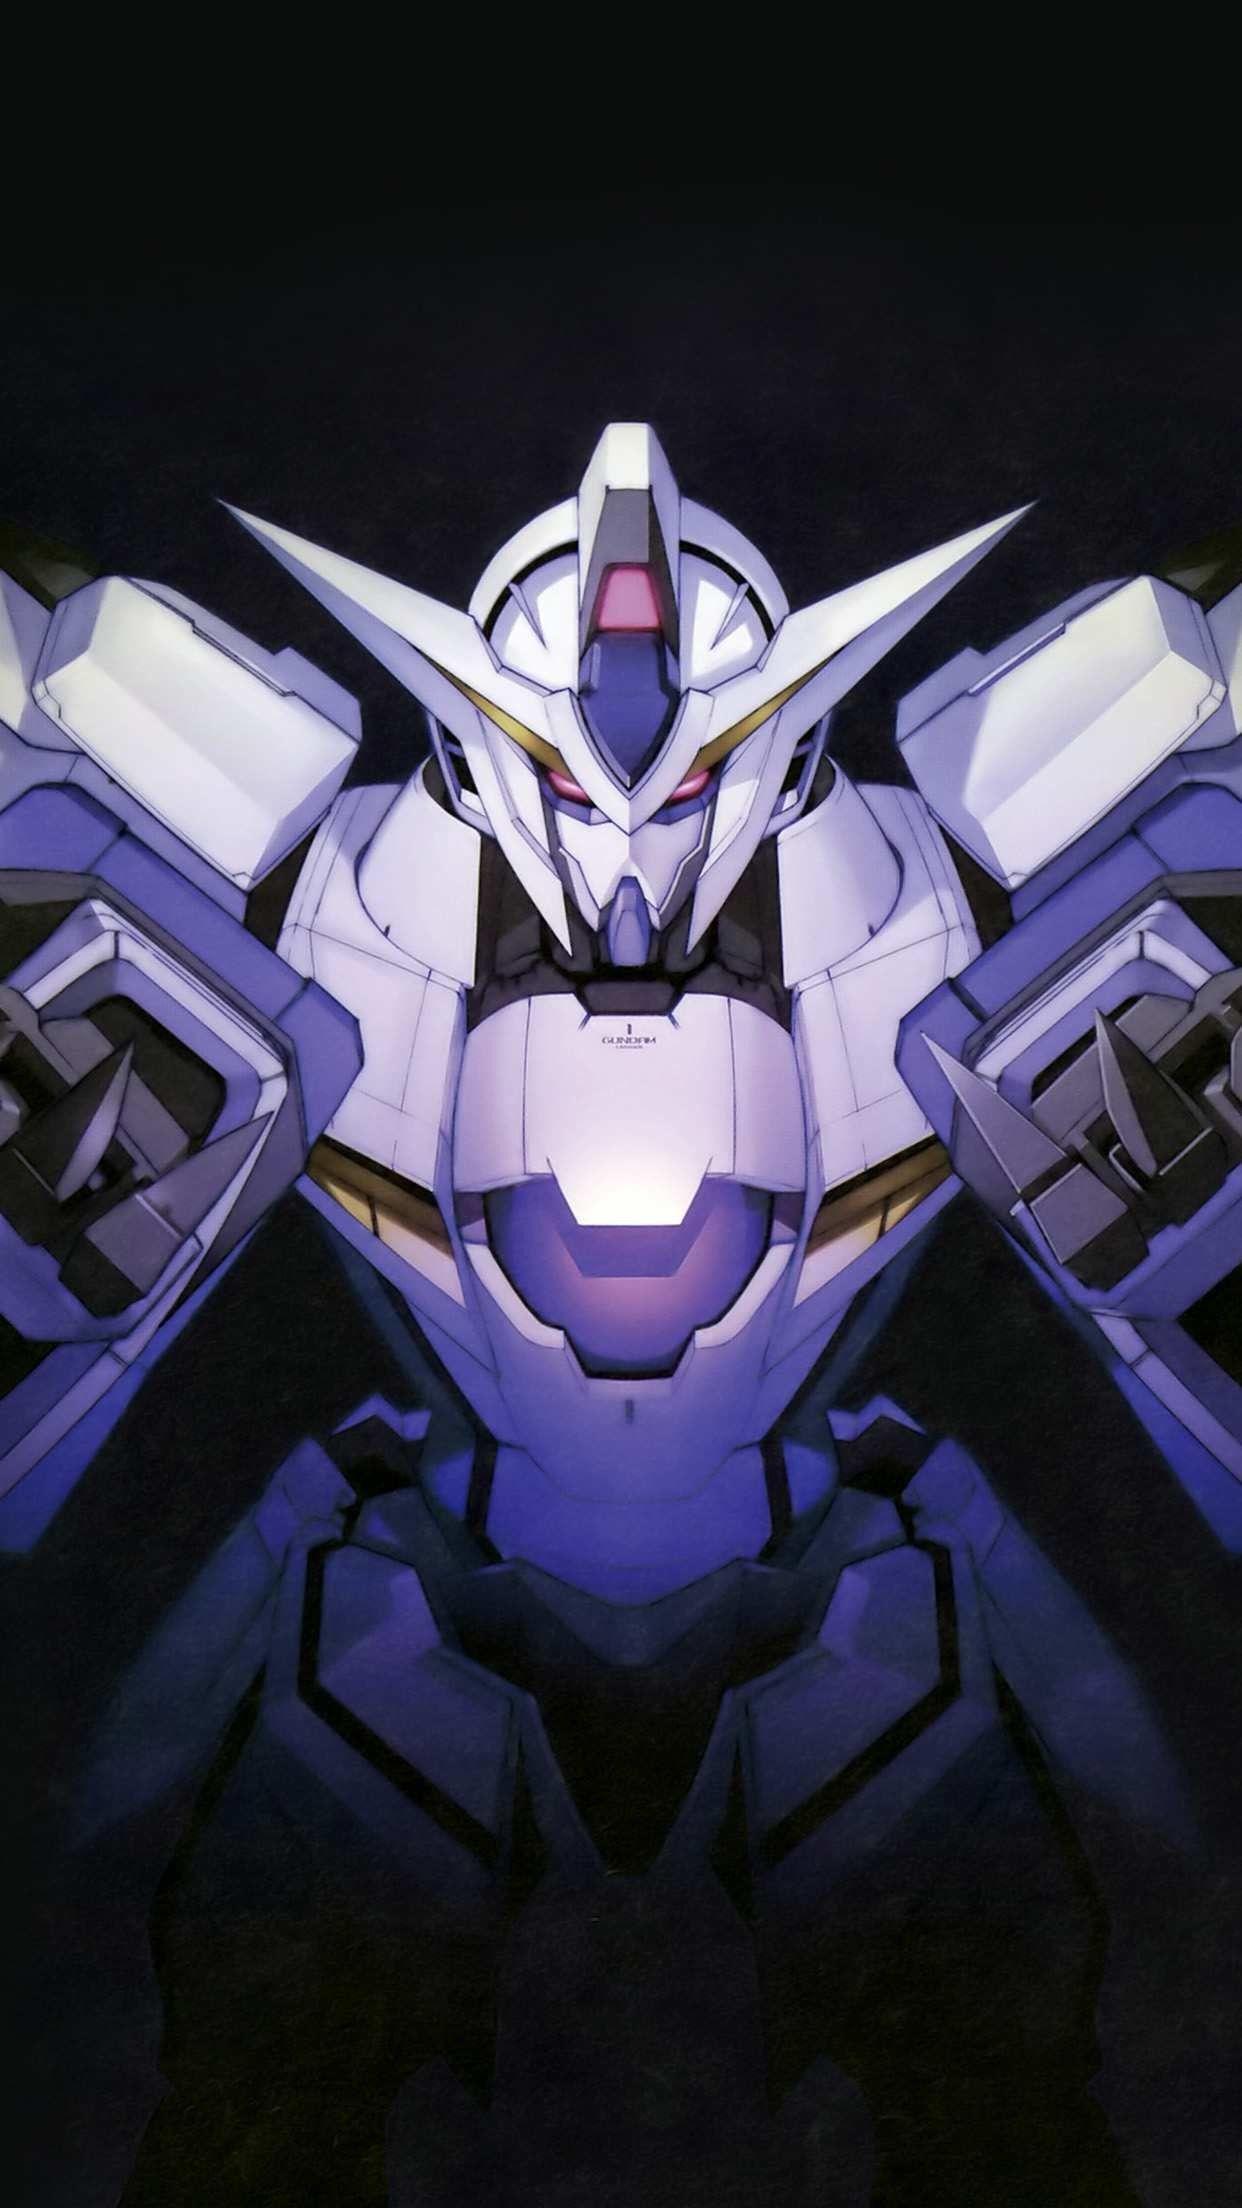 1242x2208 I Love Papers Am63 Gundam Art Dark Toy Game